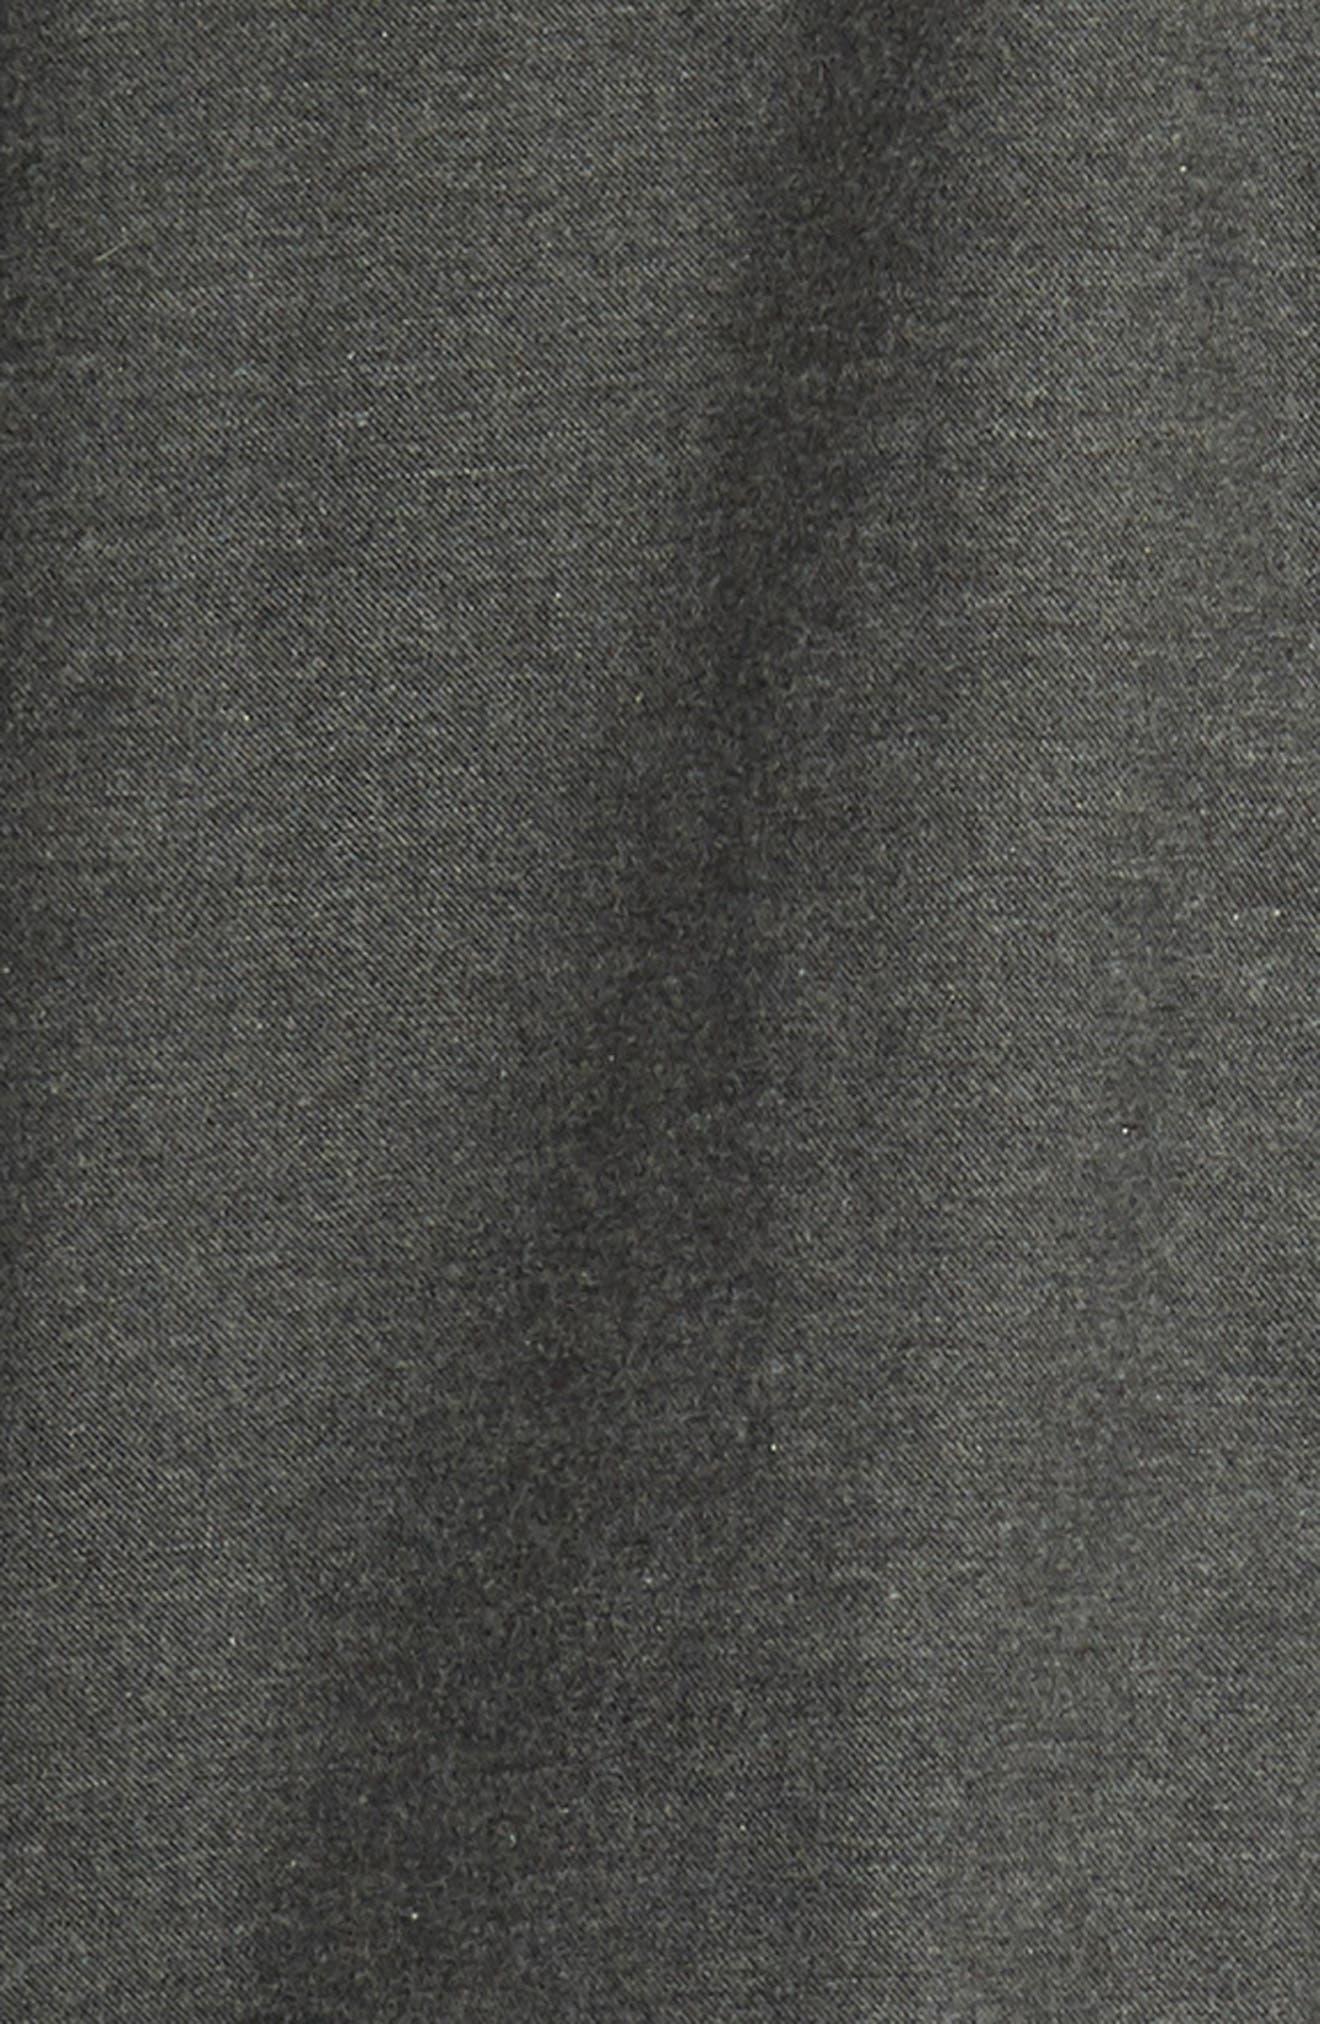 Brushed Cotton & Cashmere Twill Sport Shirt,                             Alternate thumbnail 6, color,                             020